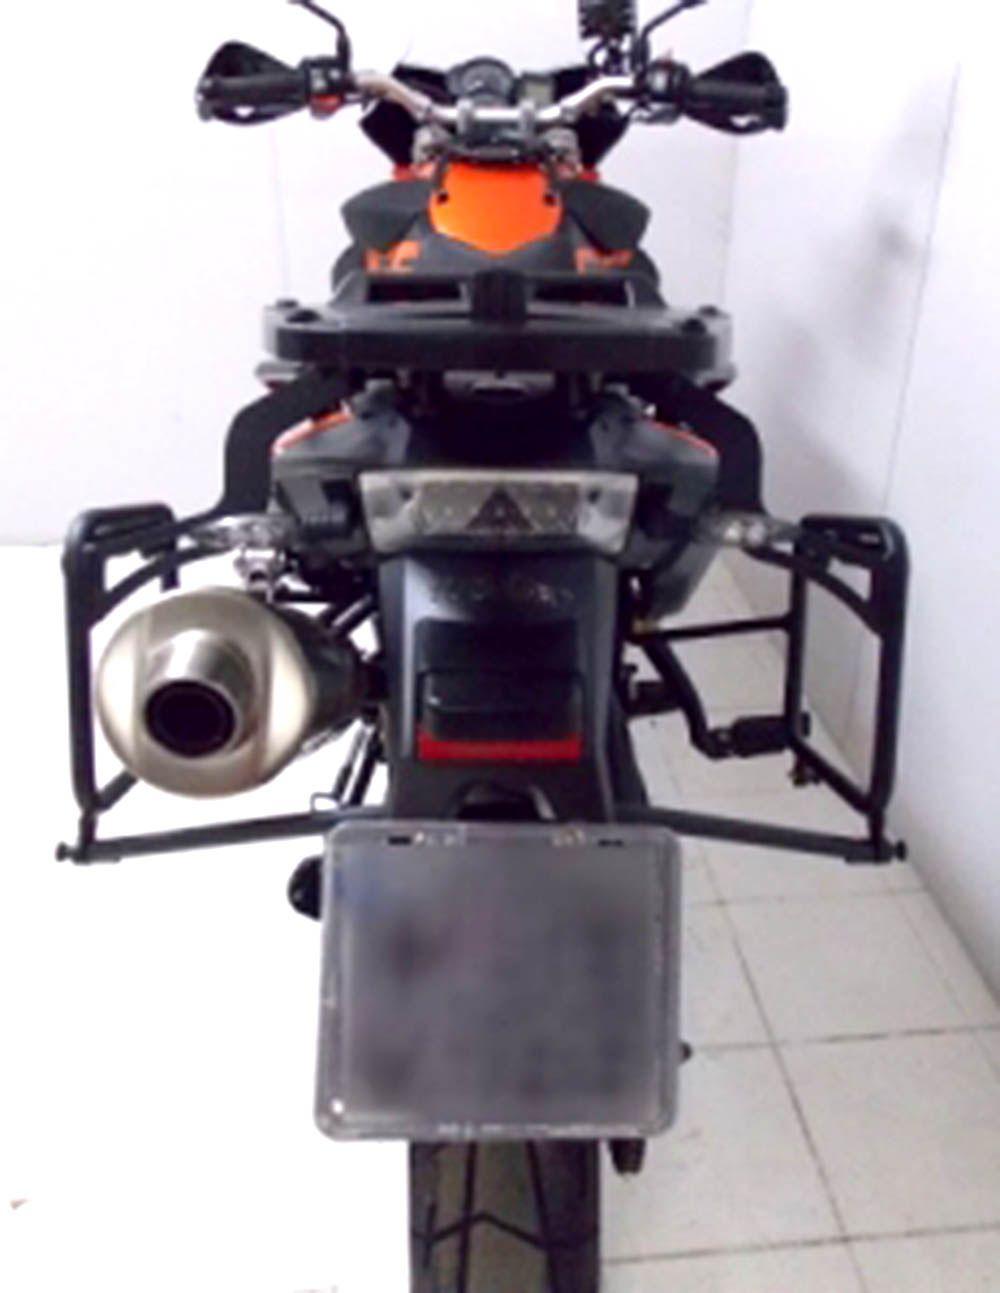 Suporte Lateral Bau Traseiro F 800 Gs, F650 Gs, Chapam 9684